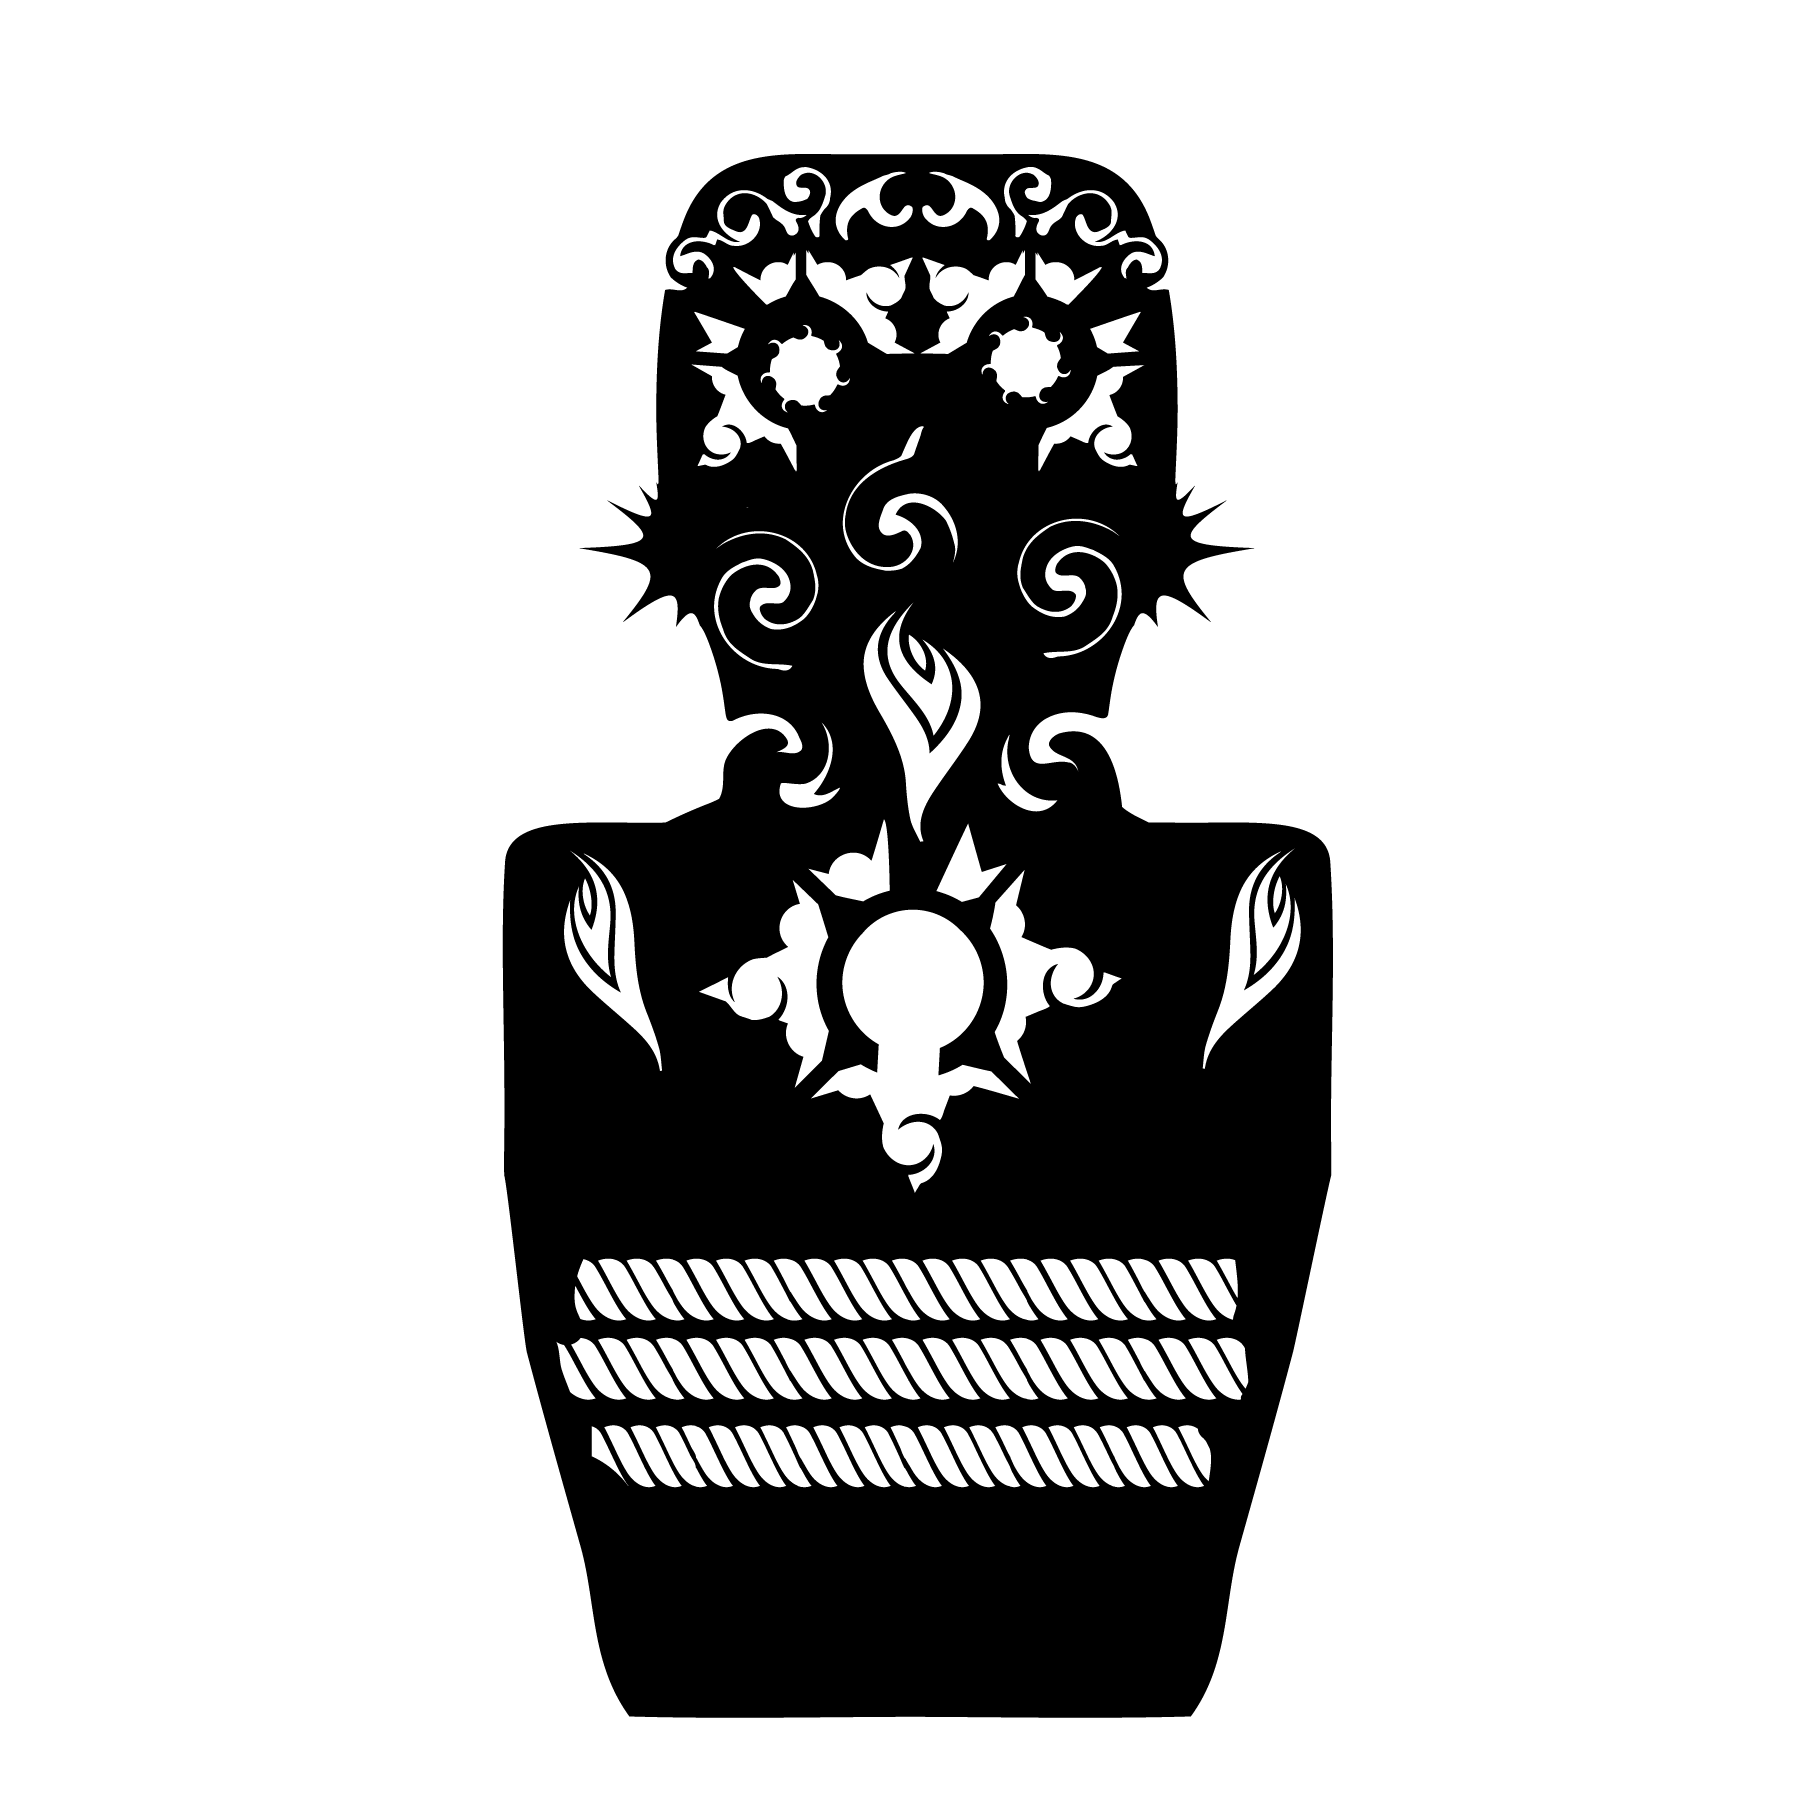 Basic Symbols-13.png